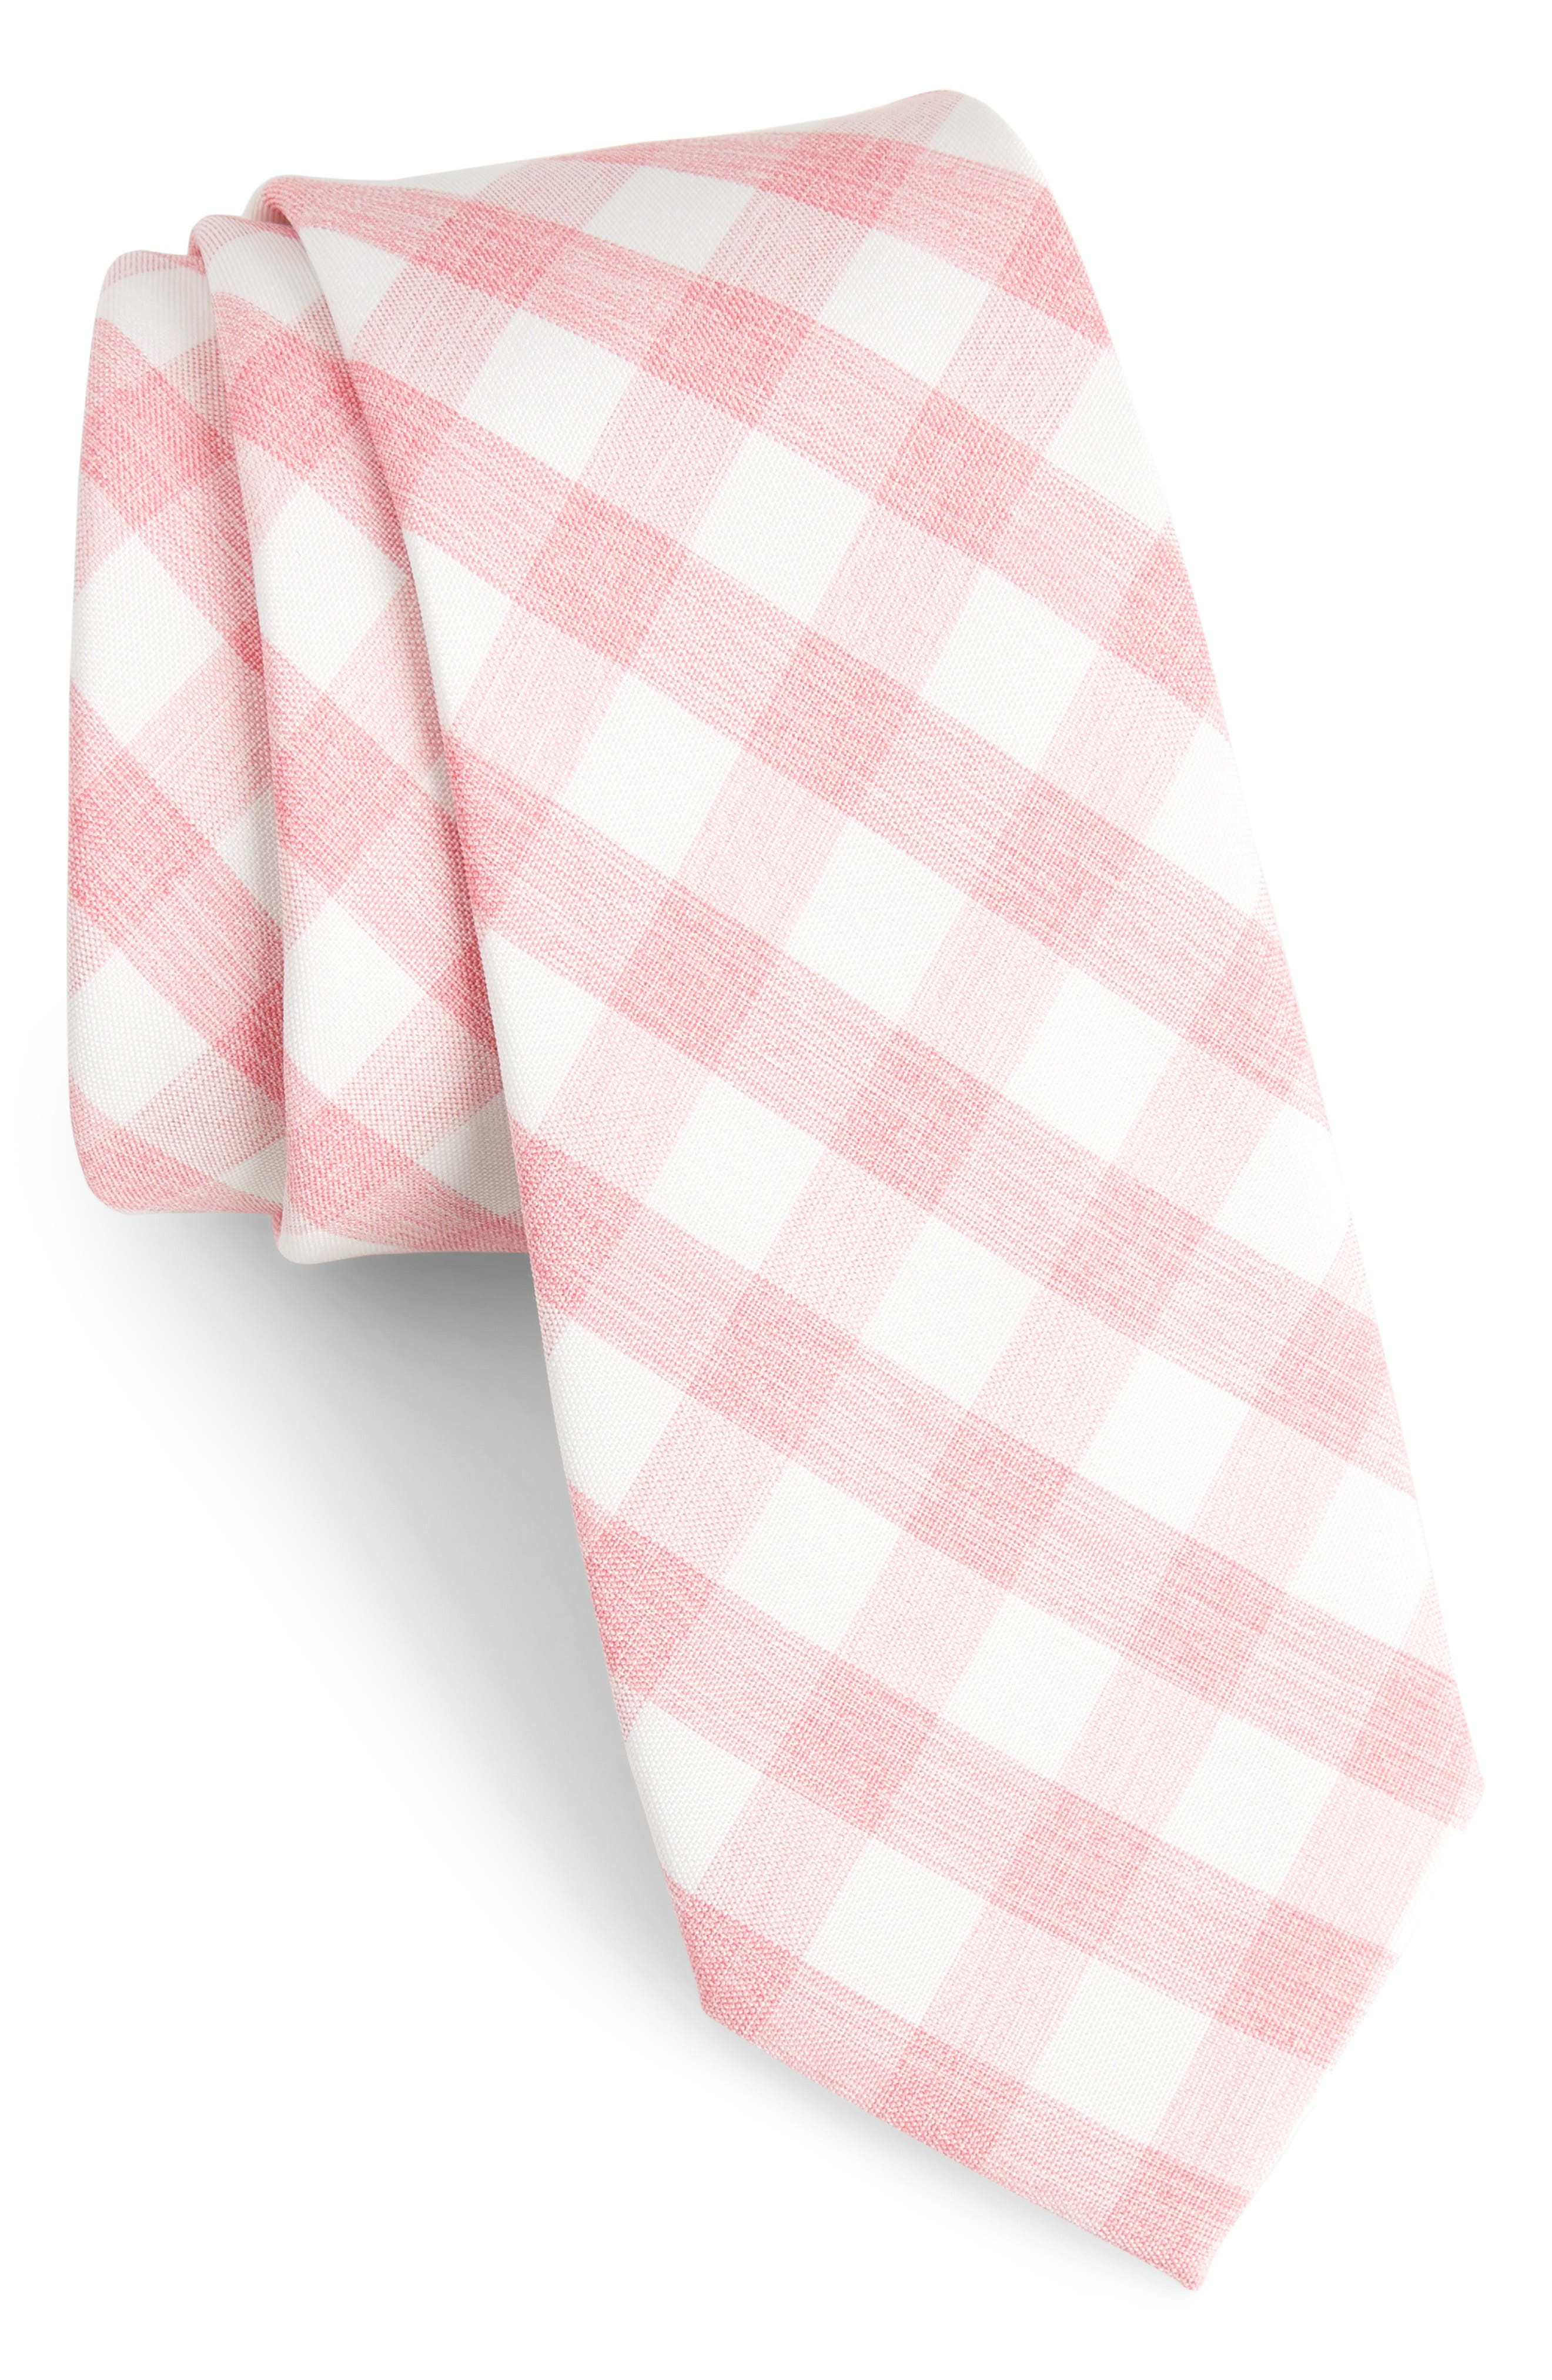 Alternate Image 1 Selected - 1901 Larkin Check Cotton Tie